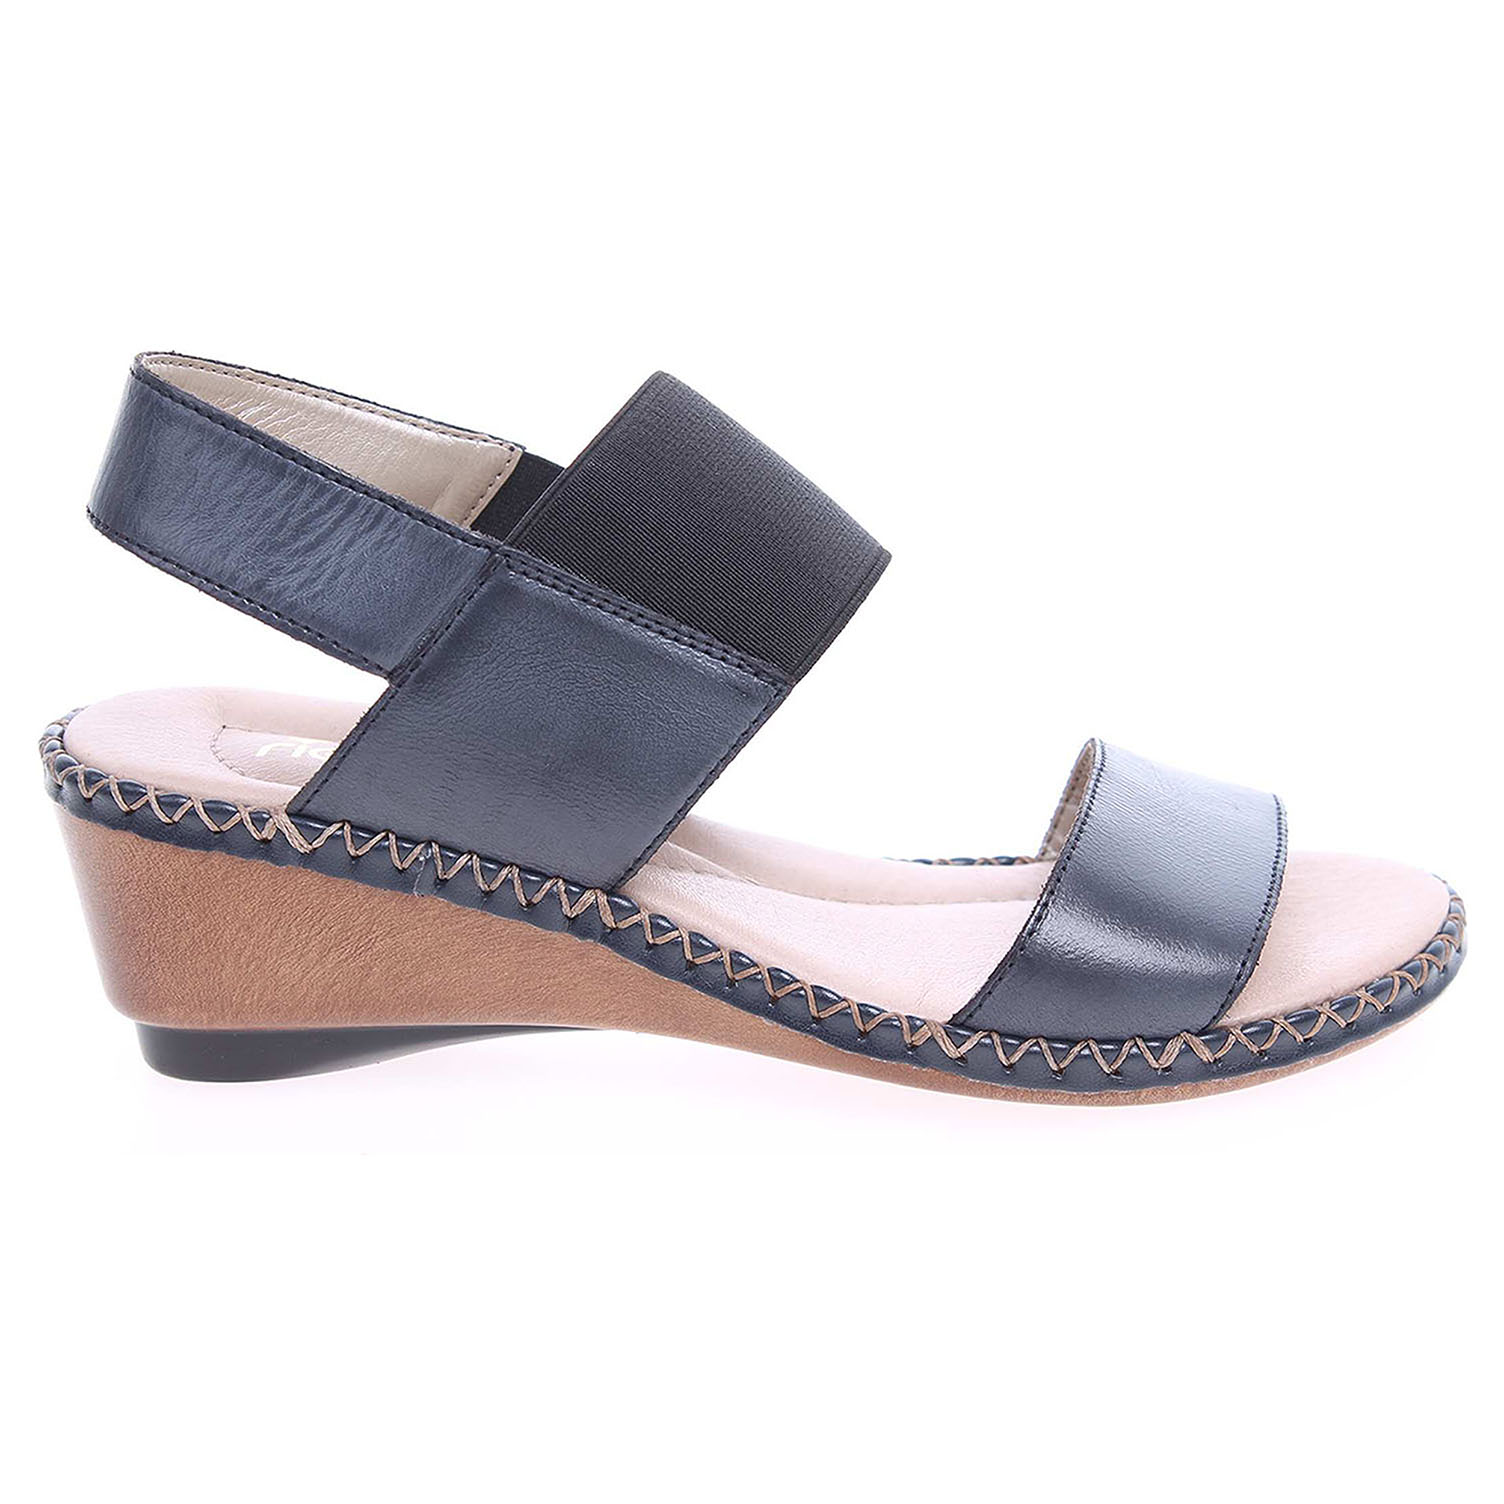 Rieker dámské sandály 66162-12 modré 37